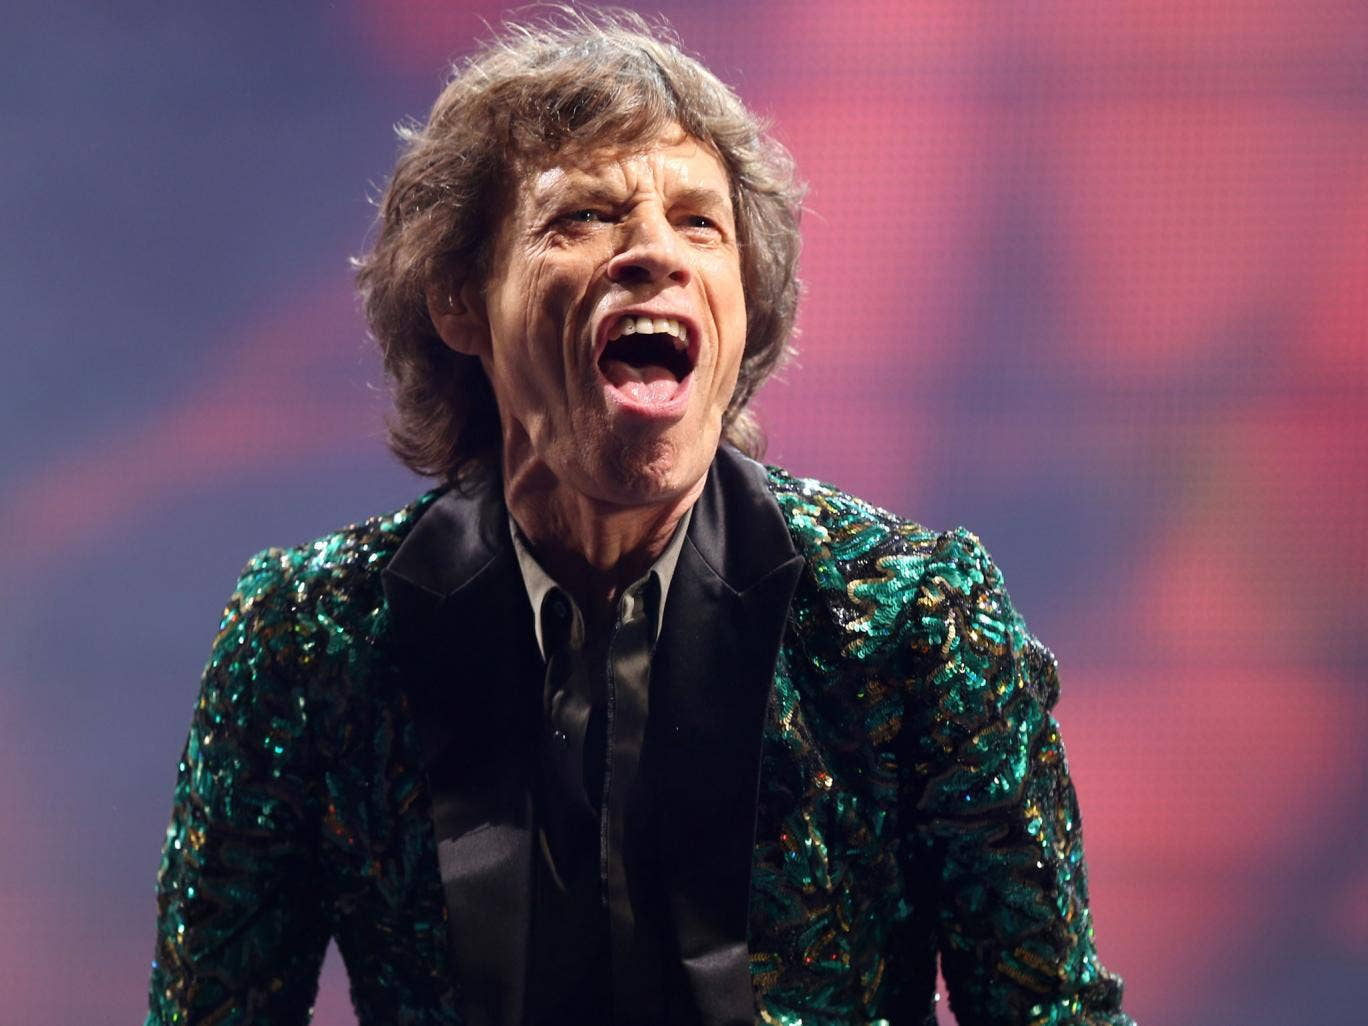 Mick Jagger performing at Glastonbury